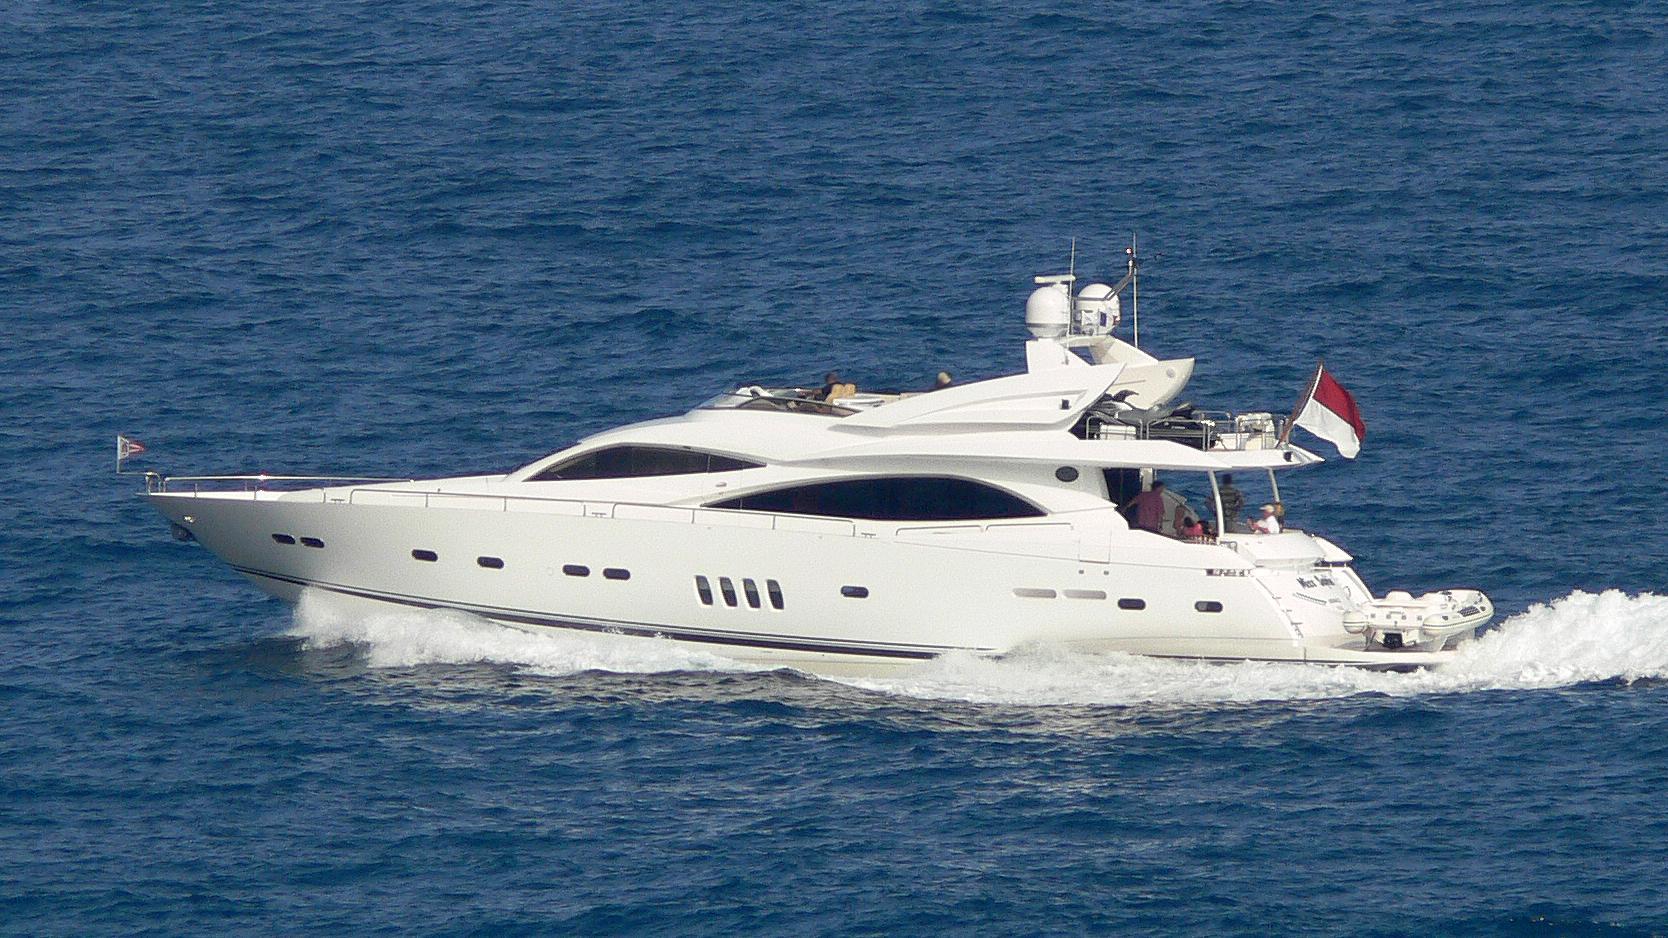 miss-irisha-motor-yacht-sunseeker-90-yacht-2006-28m-profile